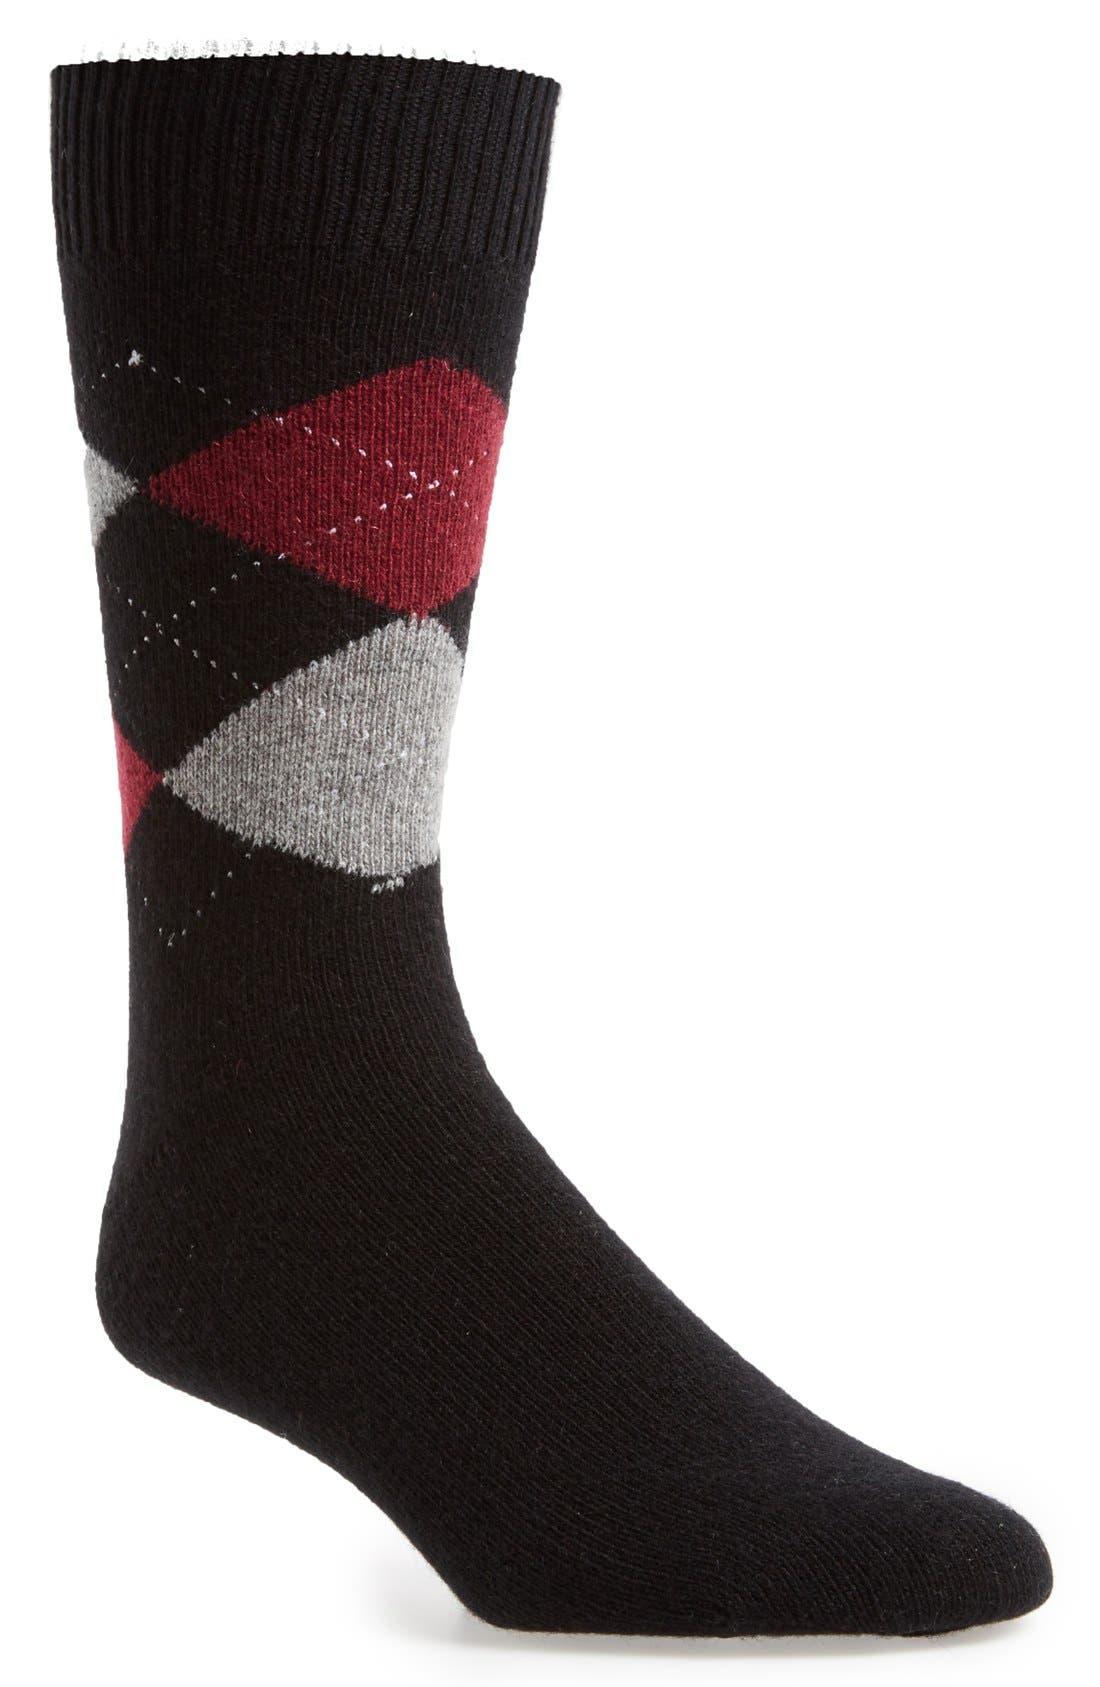 Alternate Image 1 Selected - John W. Nordstrom® Argyle Cashmere Socks